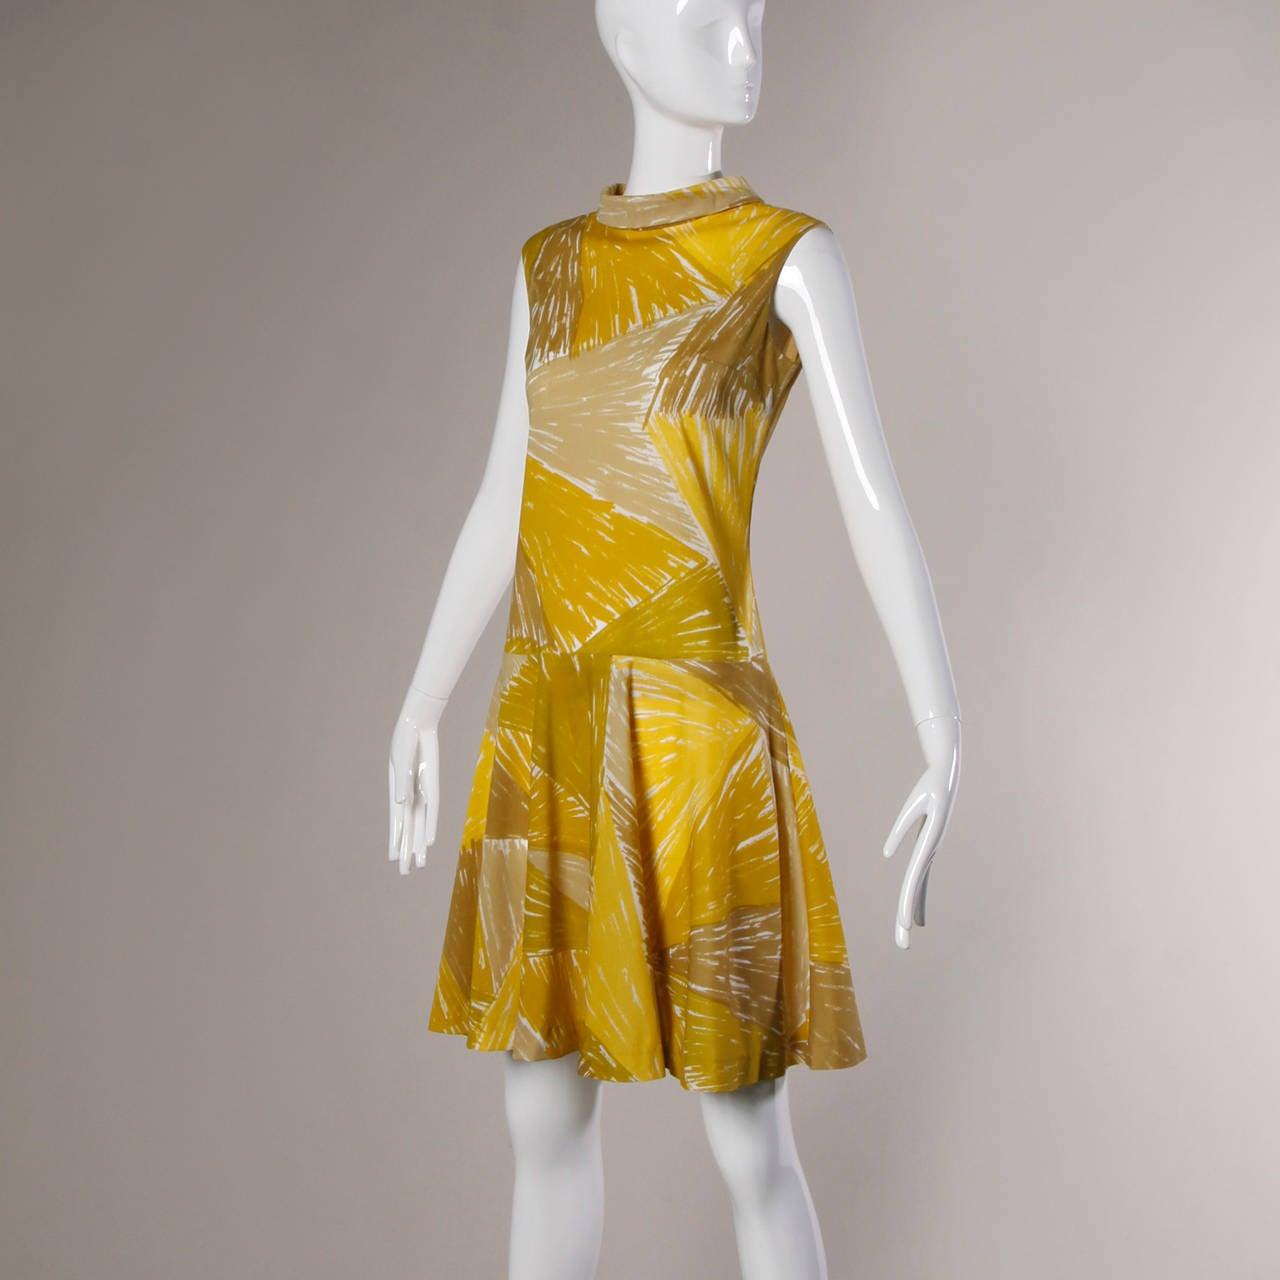 Brown Vera Neumann Vintage 1960s Yellow Mod Painterly Print Mini Dress For Sale